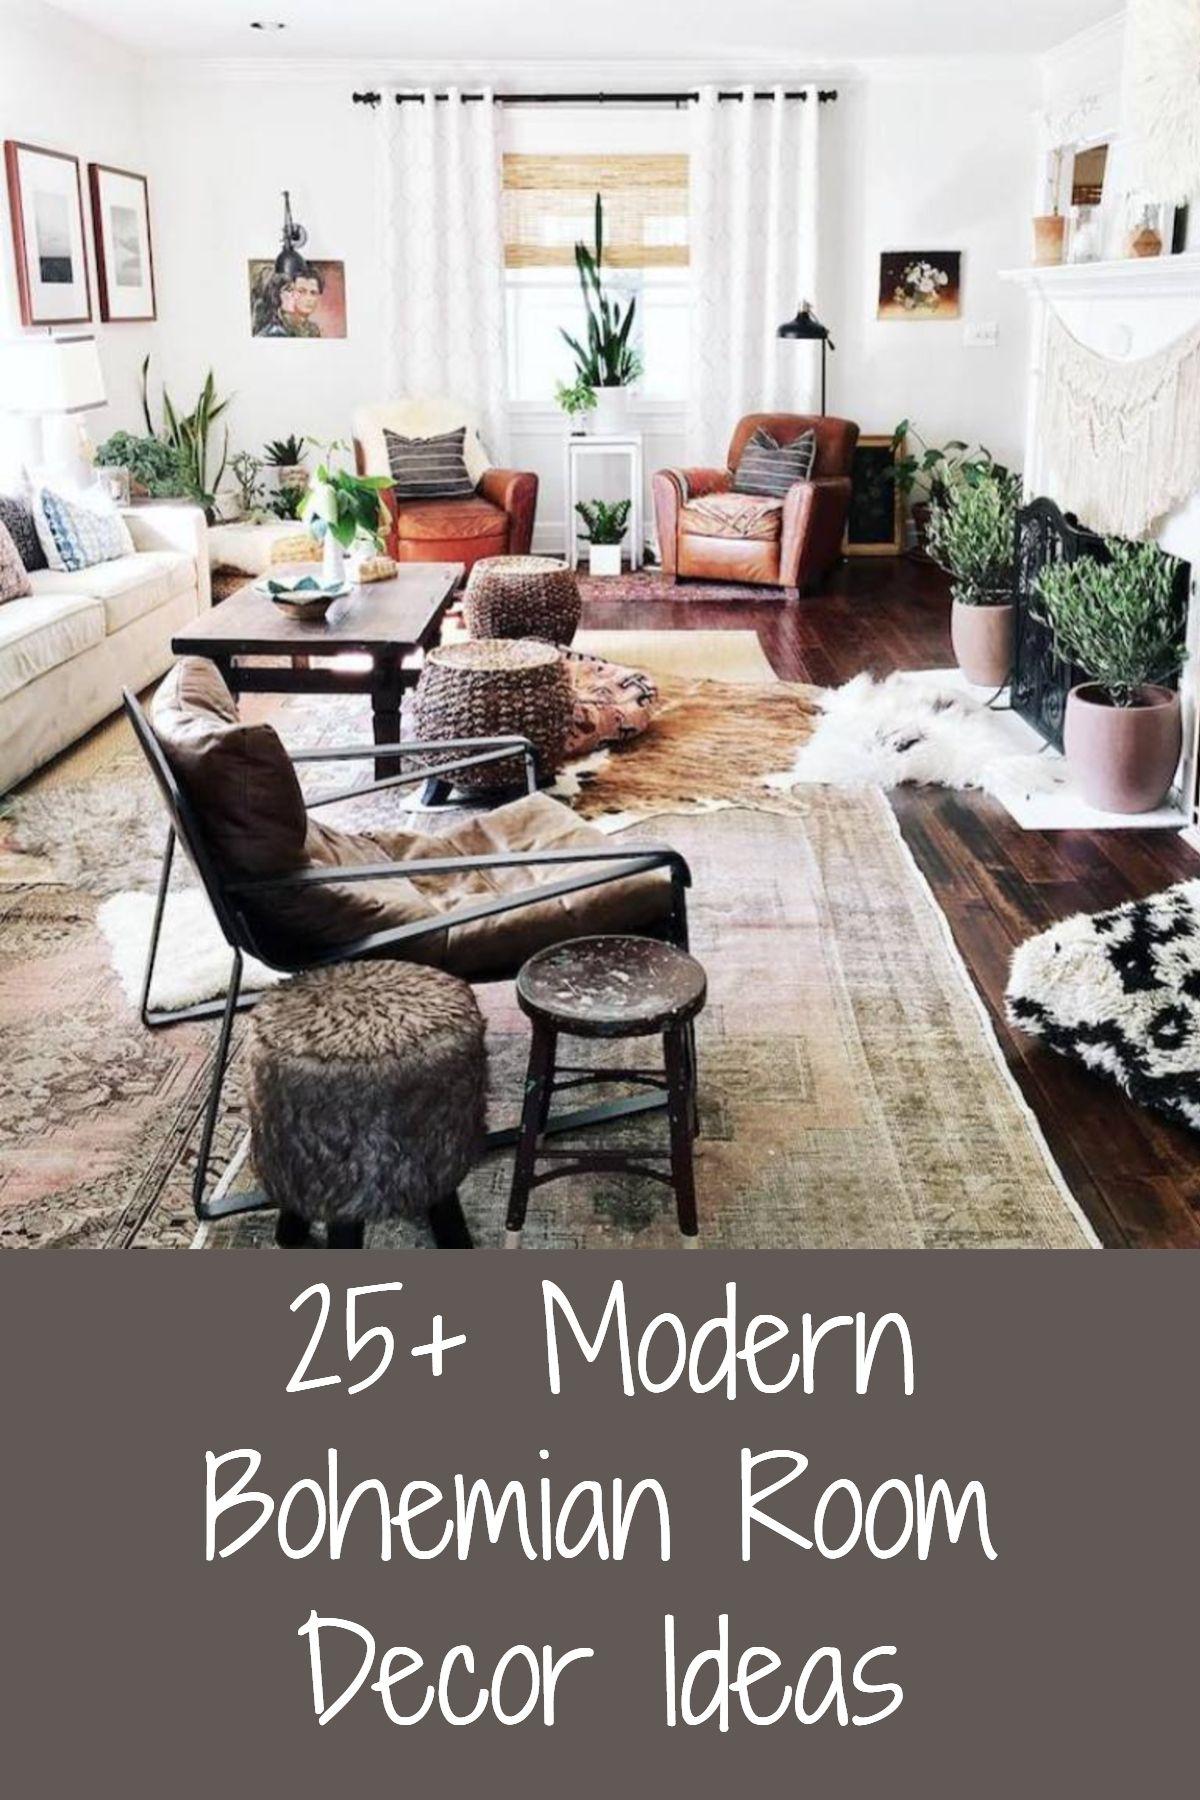 51 Bohemian Chic Decor Ideas In 2020 Boho Living Room Bohemian